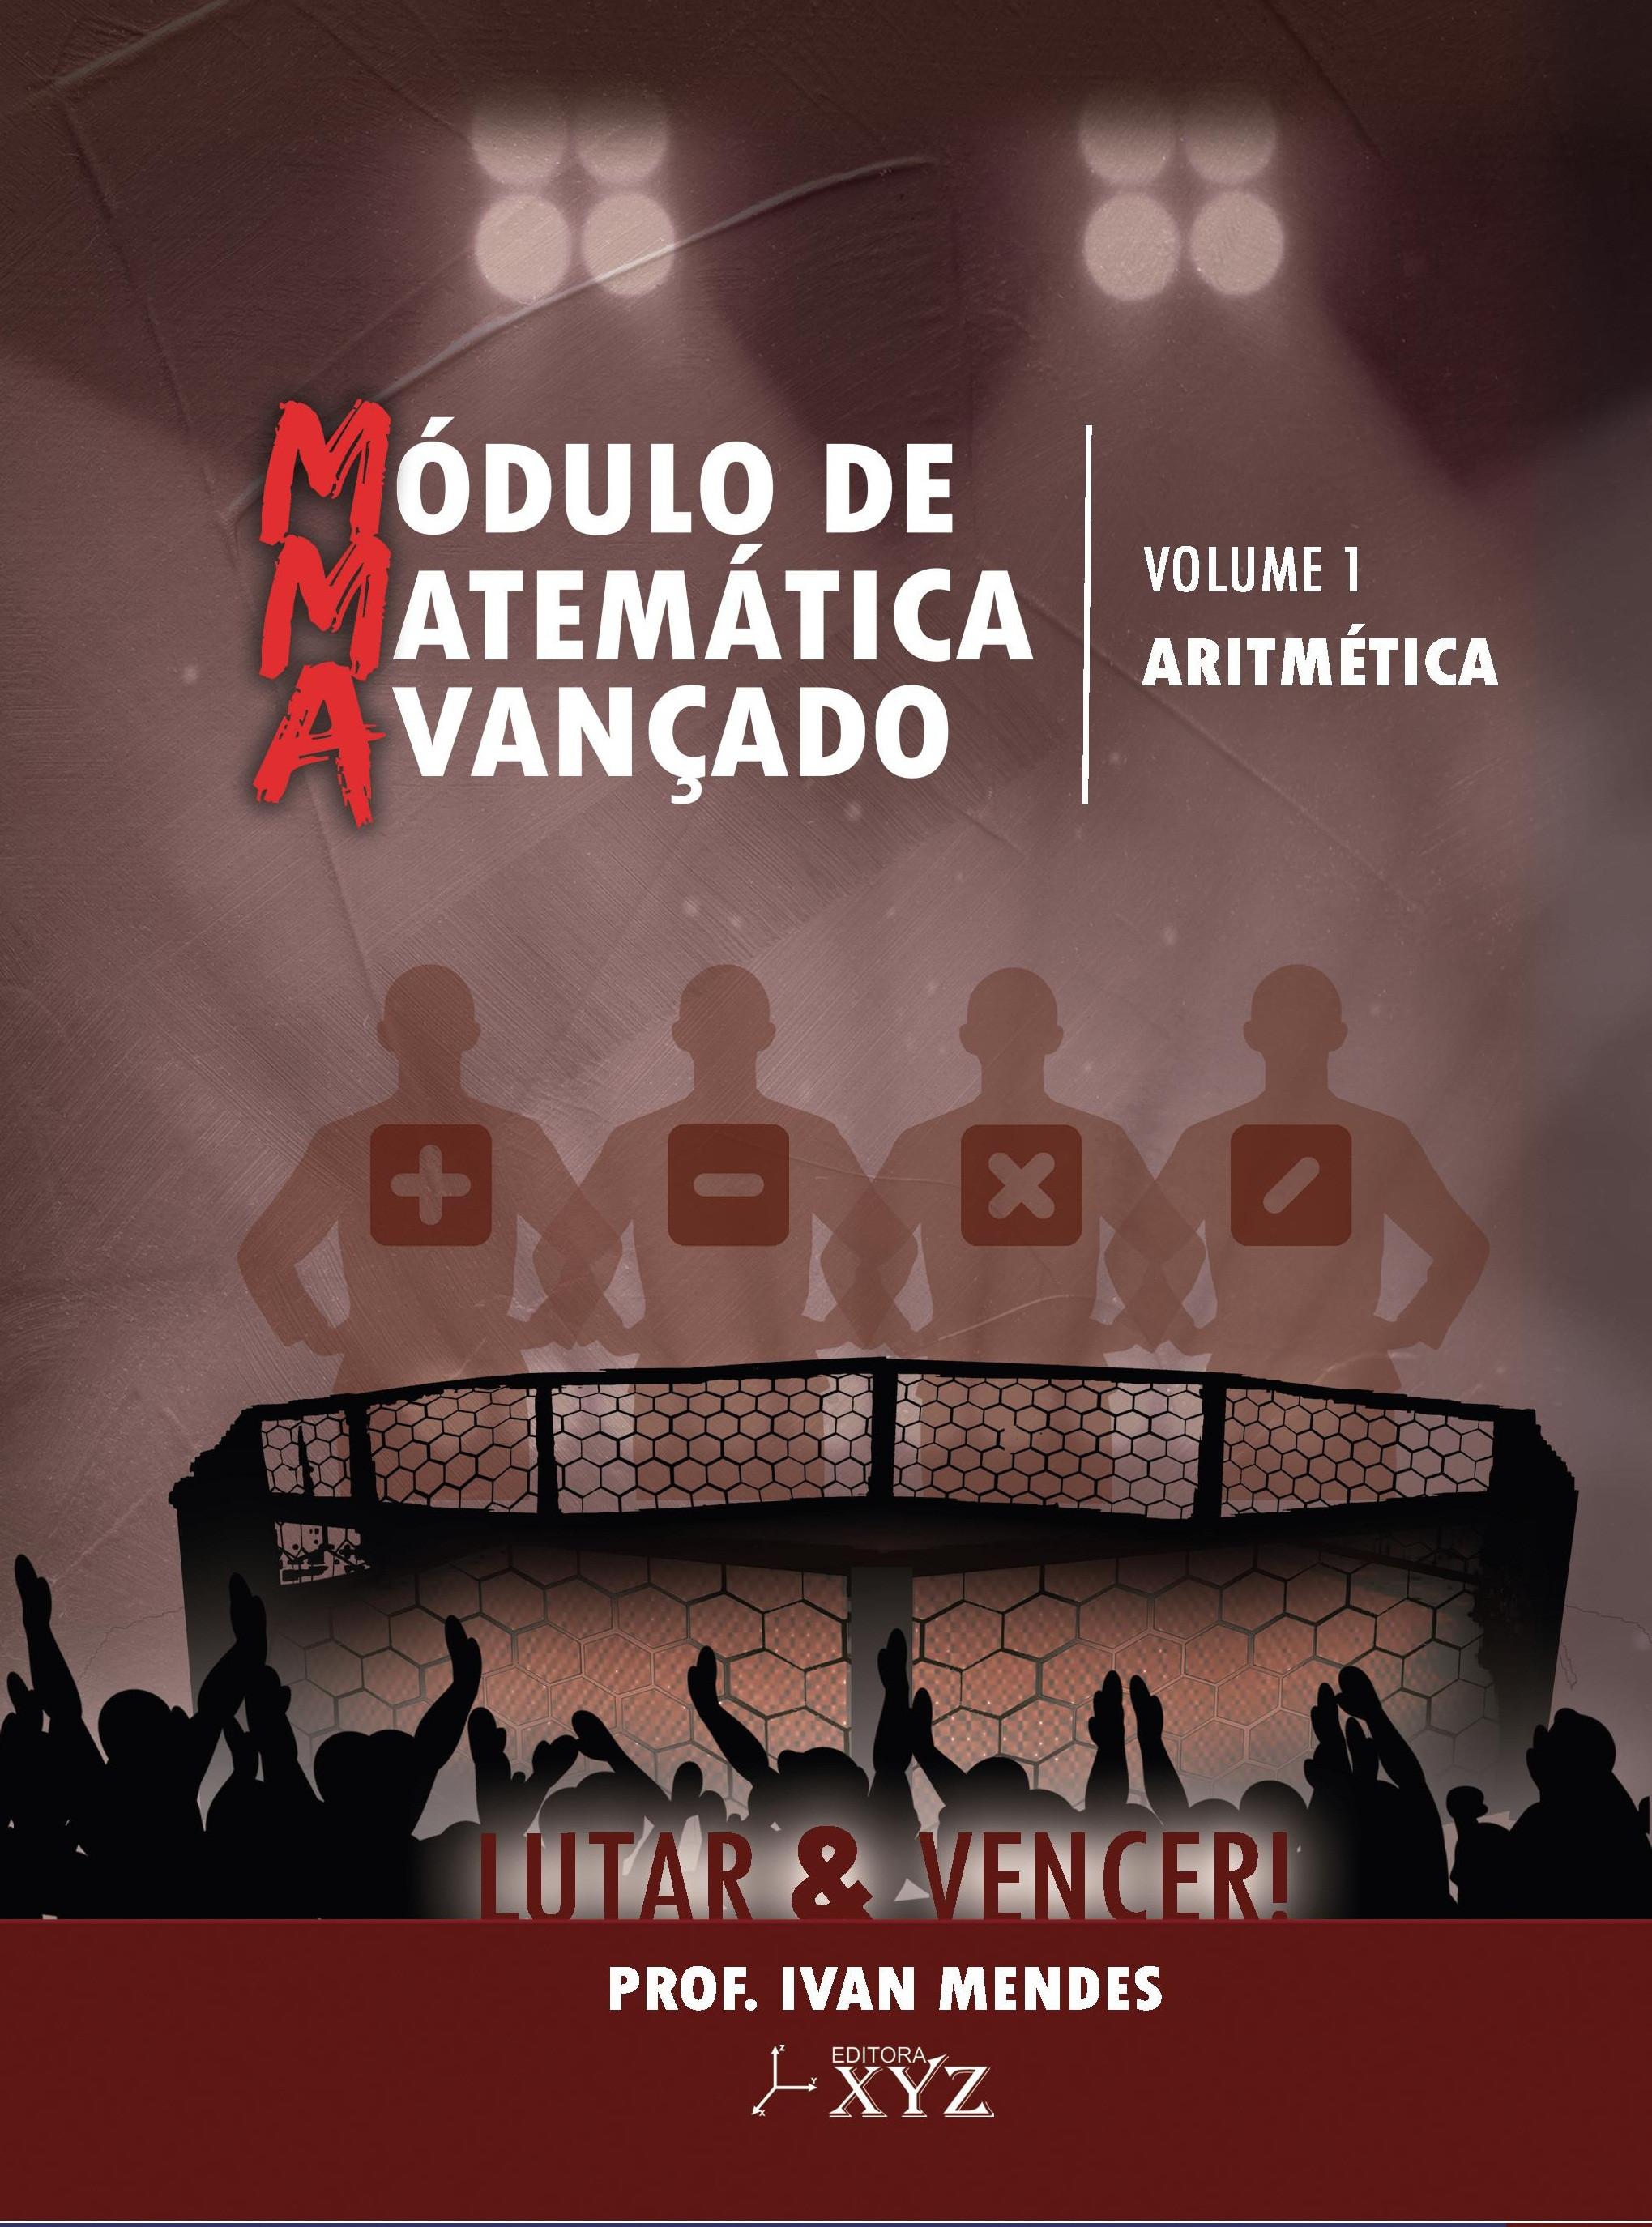 M.M.A - Modulo de Matemática Avançado, Volume 1, ARITMÉTICA